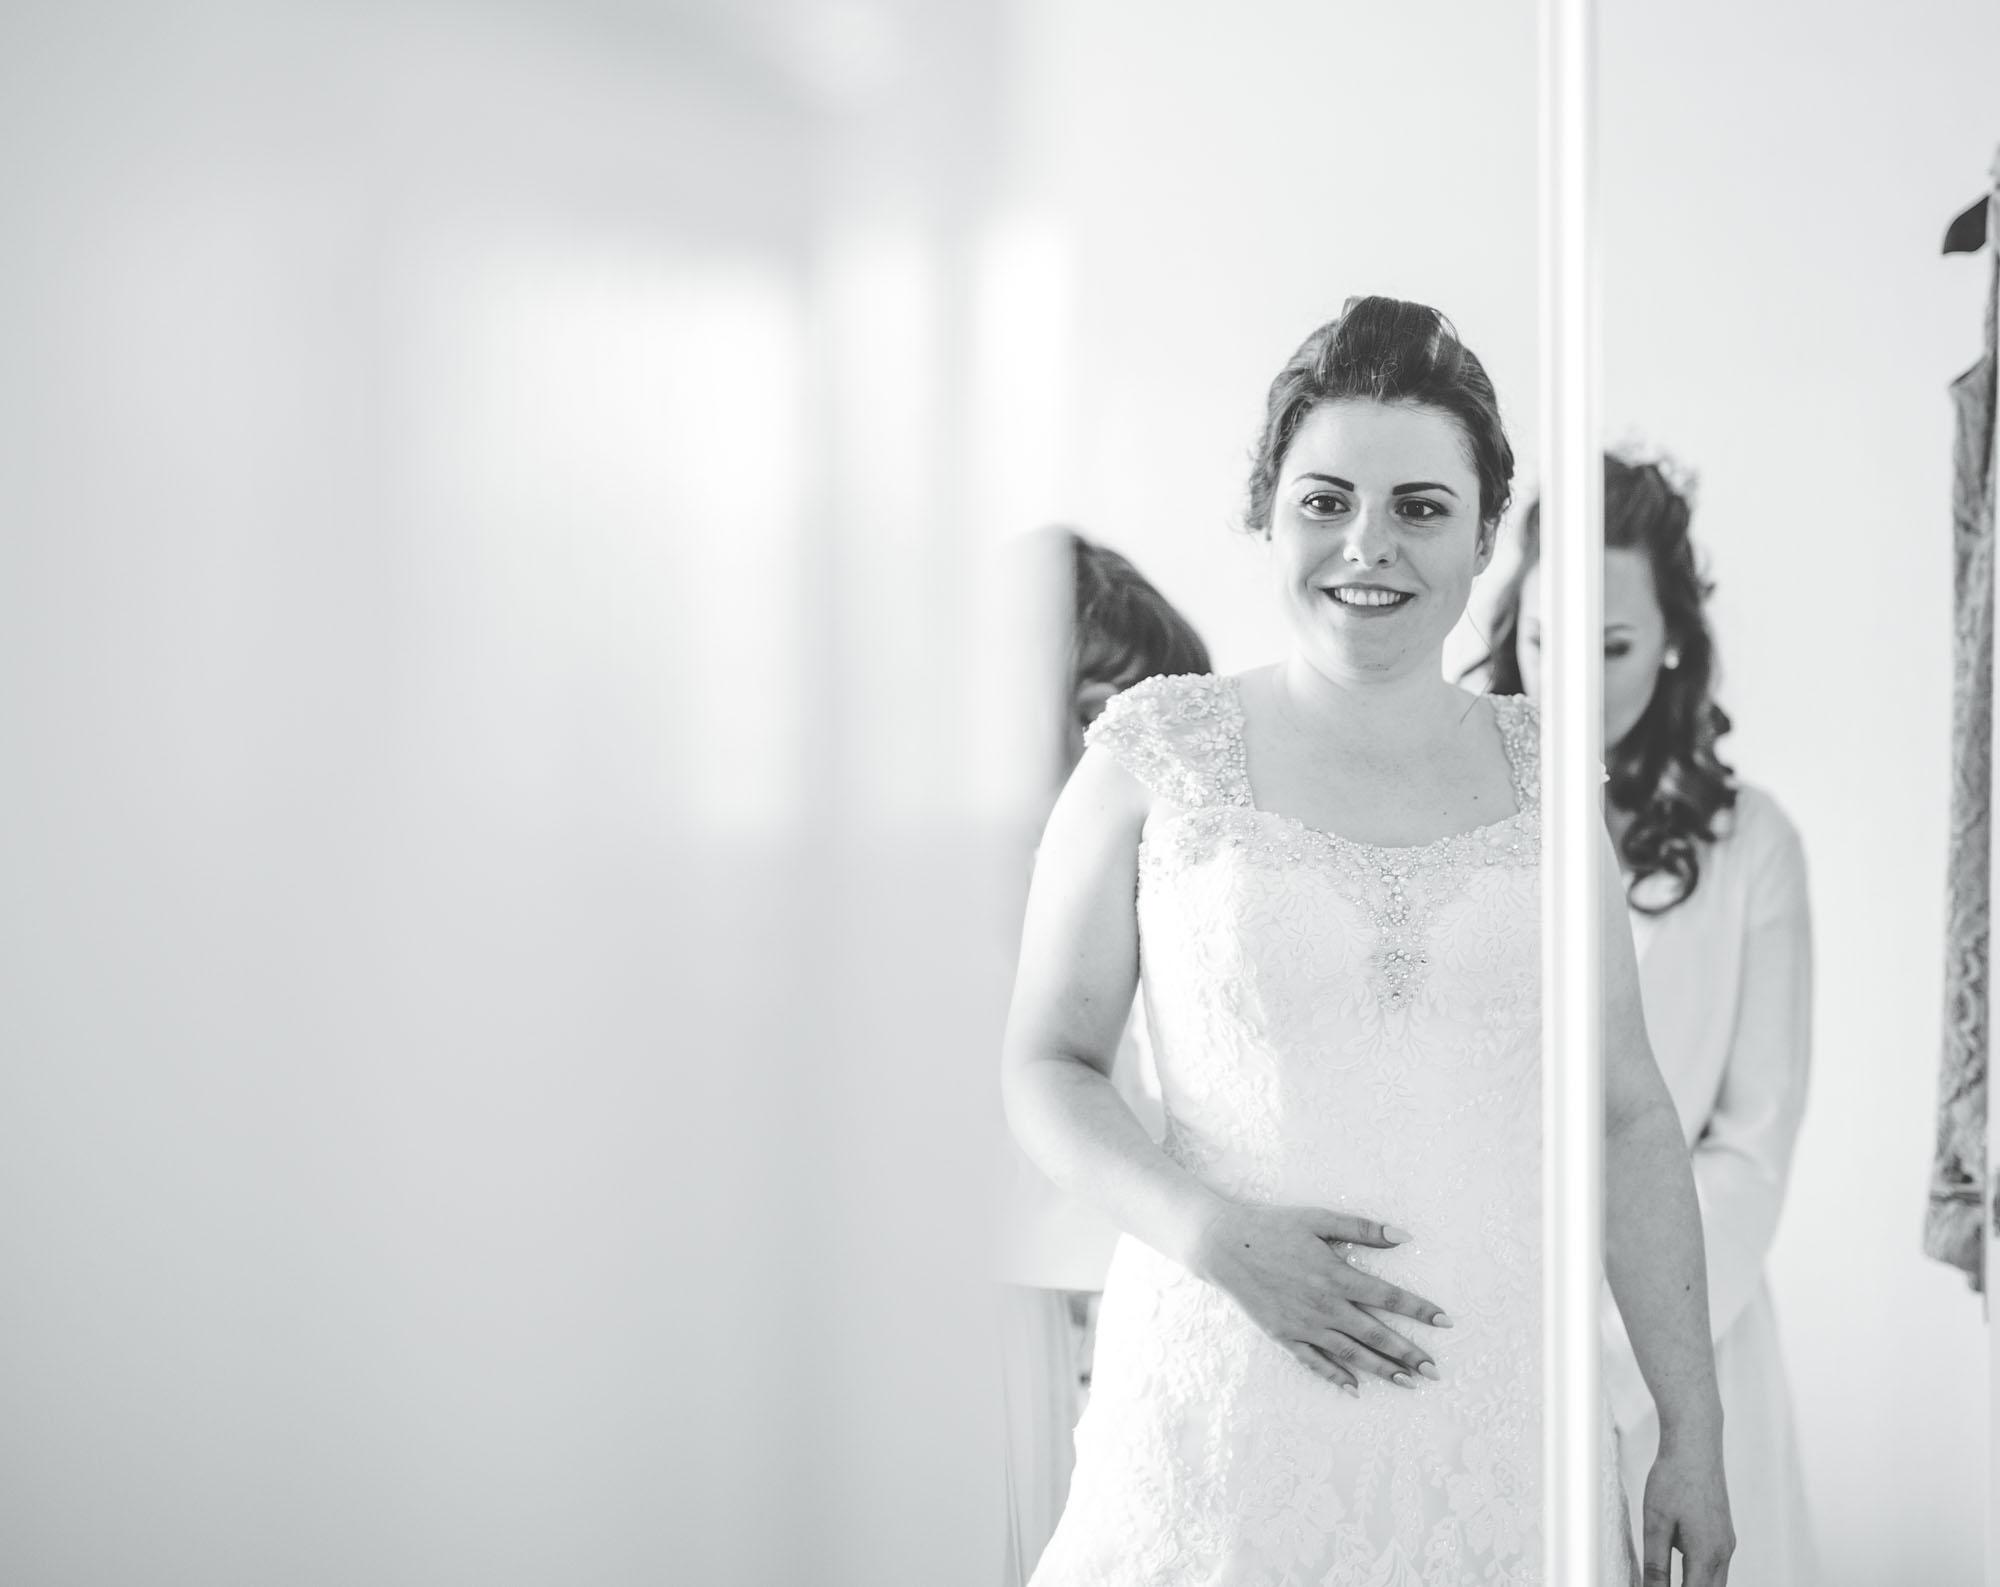 bride getting dressed - wedding photography Lancashire